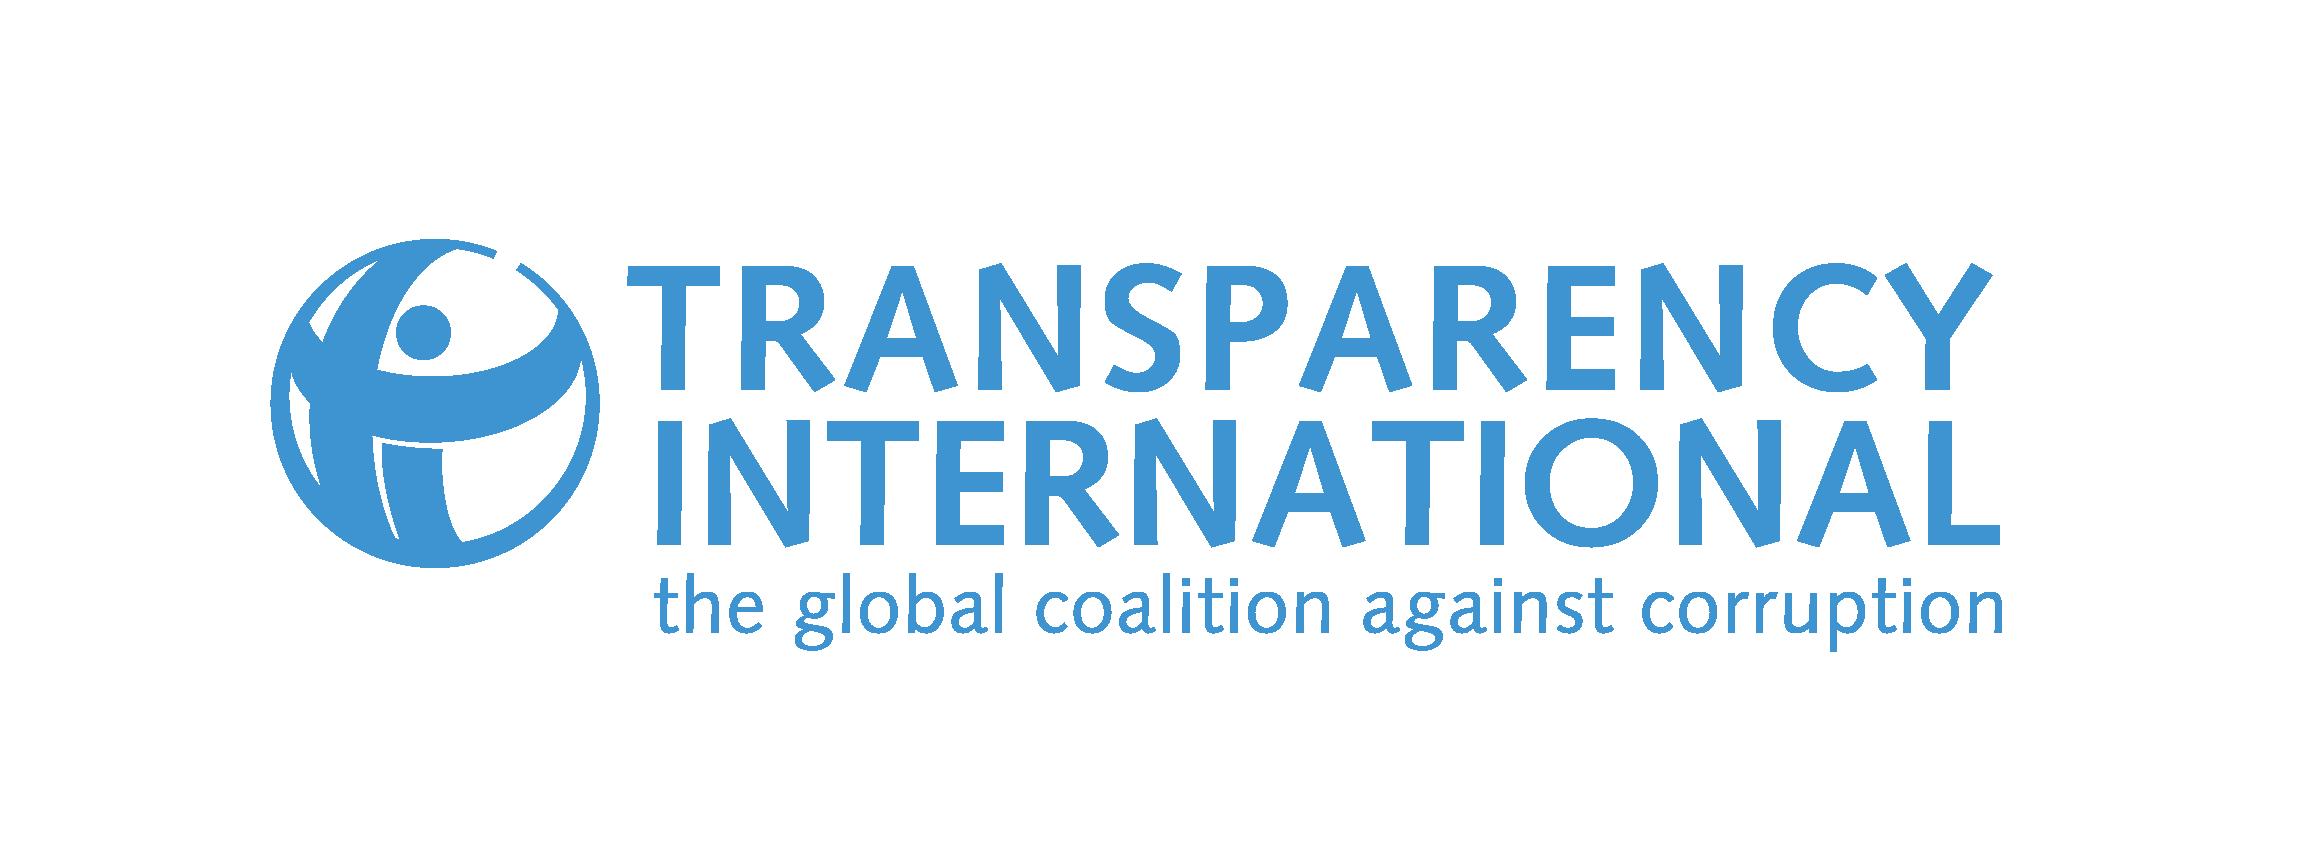 2012-transparency-international-logo-subline-01.png